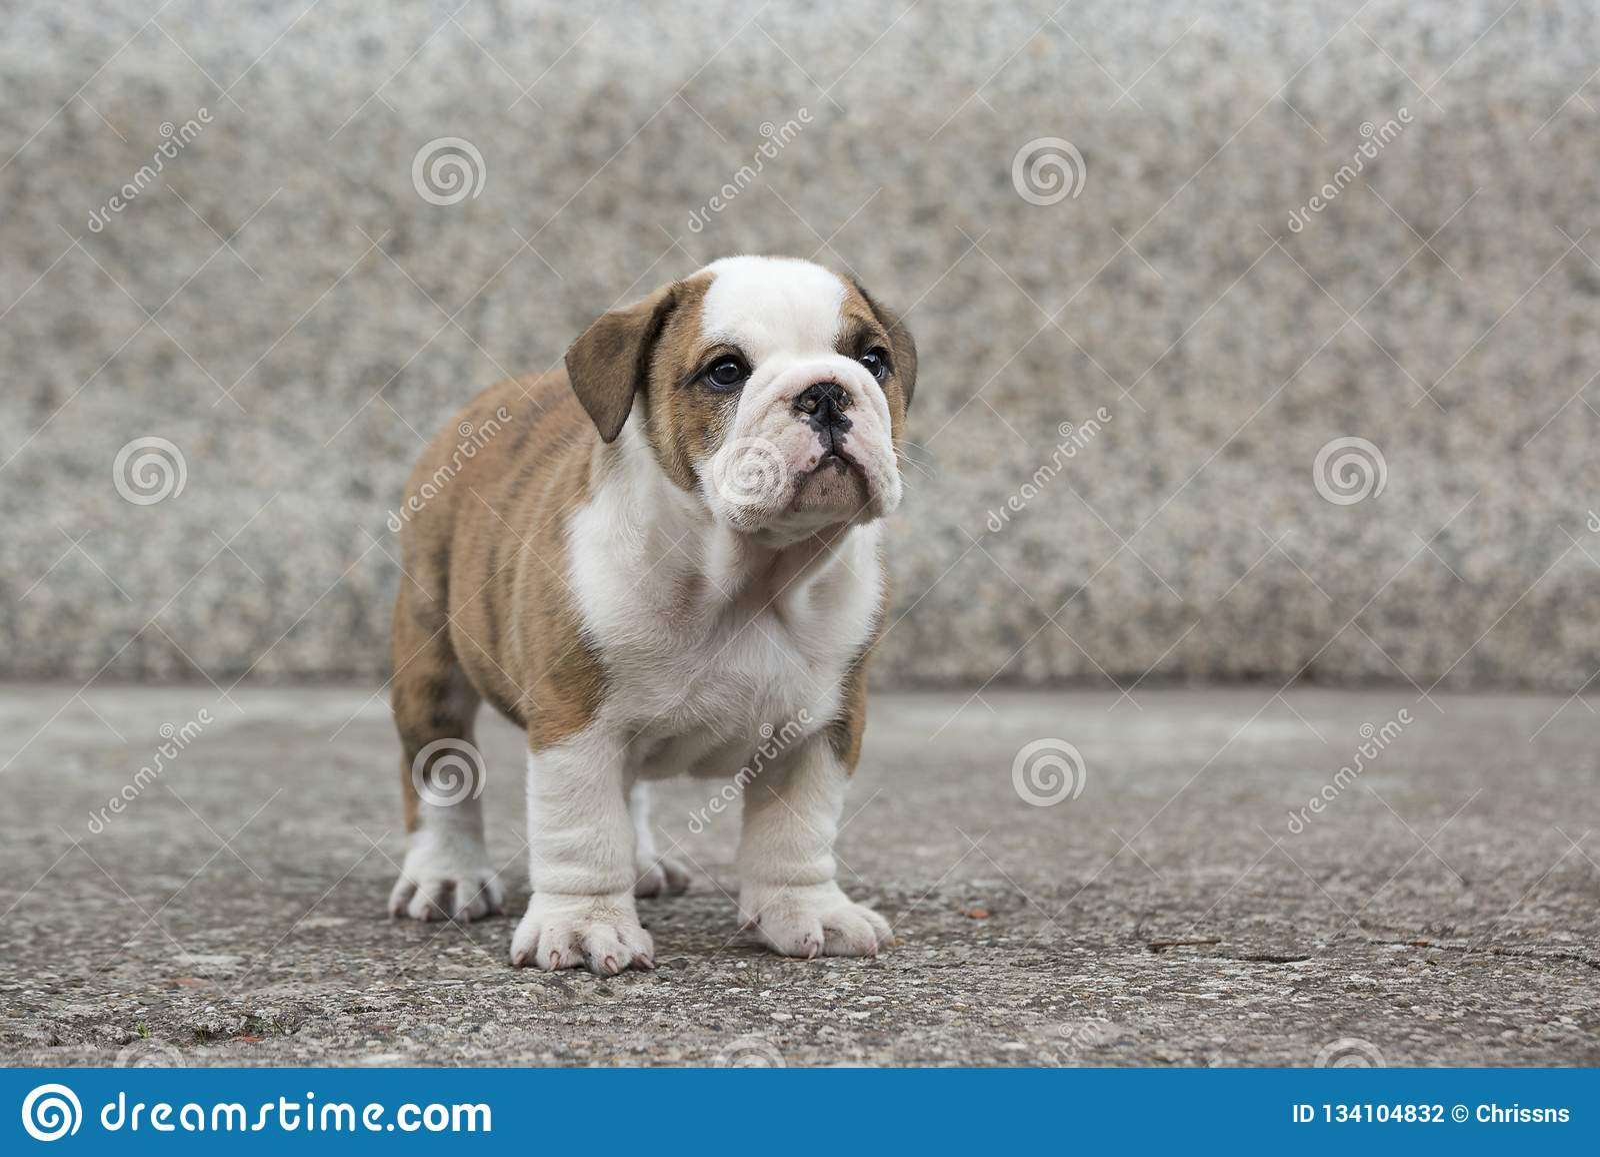 English Bulldog Puppies Backyard Playing Young Dogs Stock Photo Image Of Happy Background 134104832